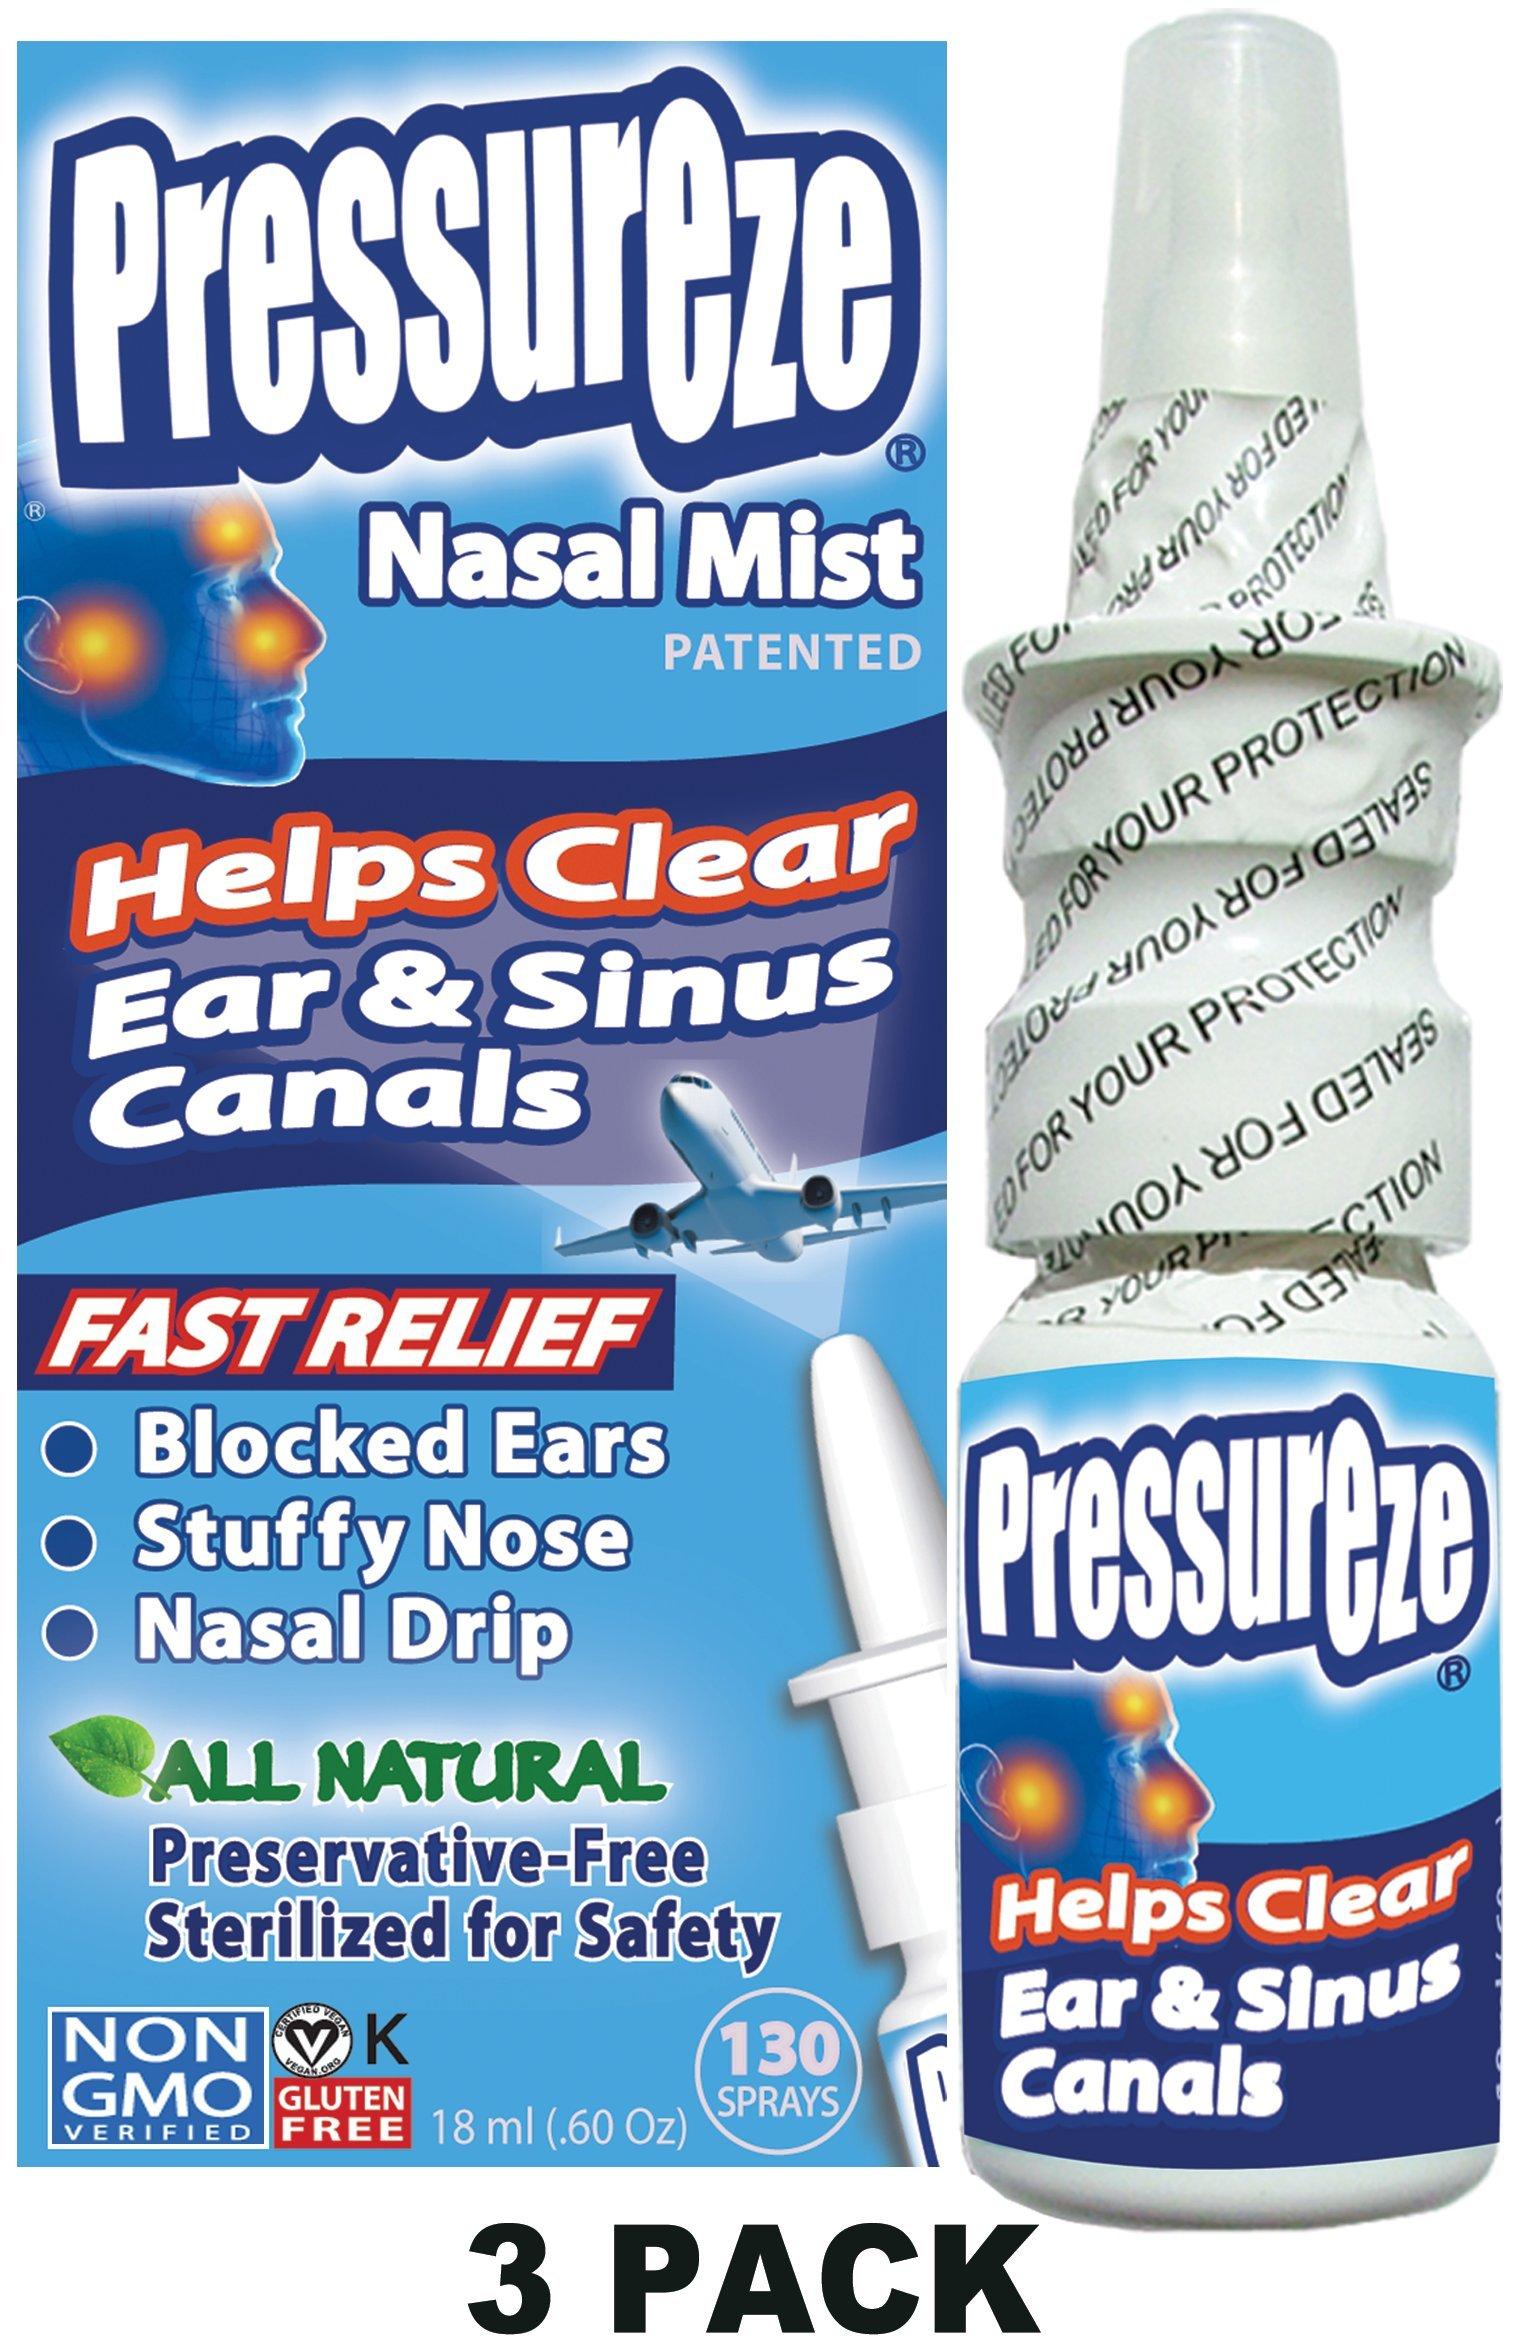 Pressureze Nasal Mist (3 PACK) .60 oz ea - All Natural, Drug Free, Preservative Free, BPA Free, Sterile, Contamination Free, NON GMO, Vegan, Gluten Free